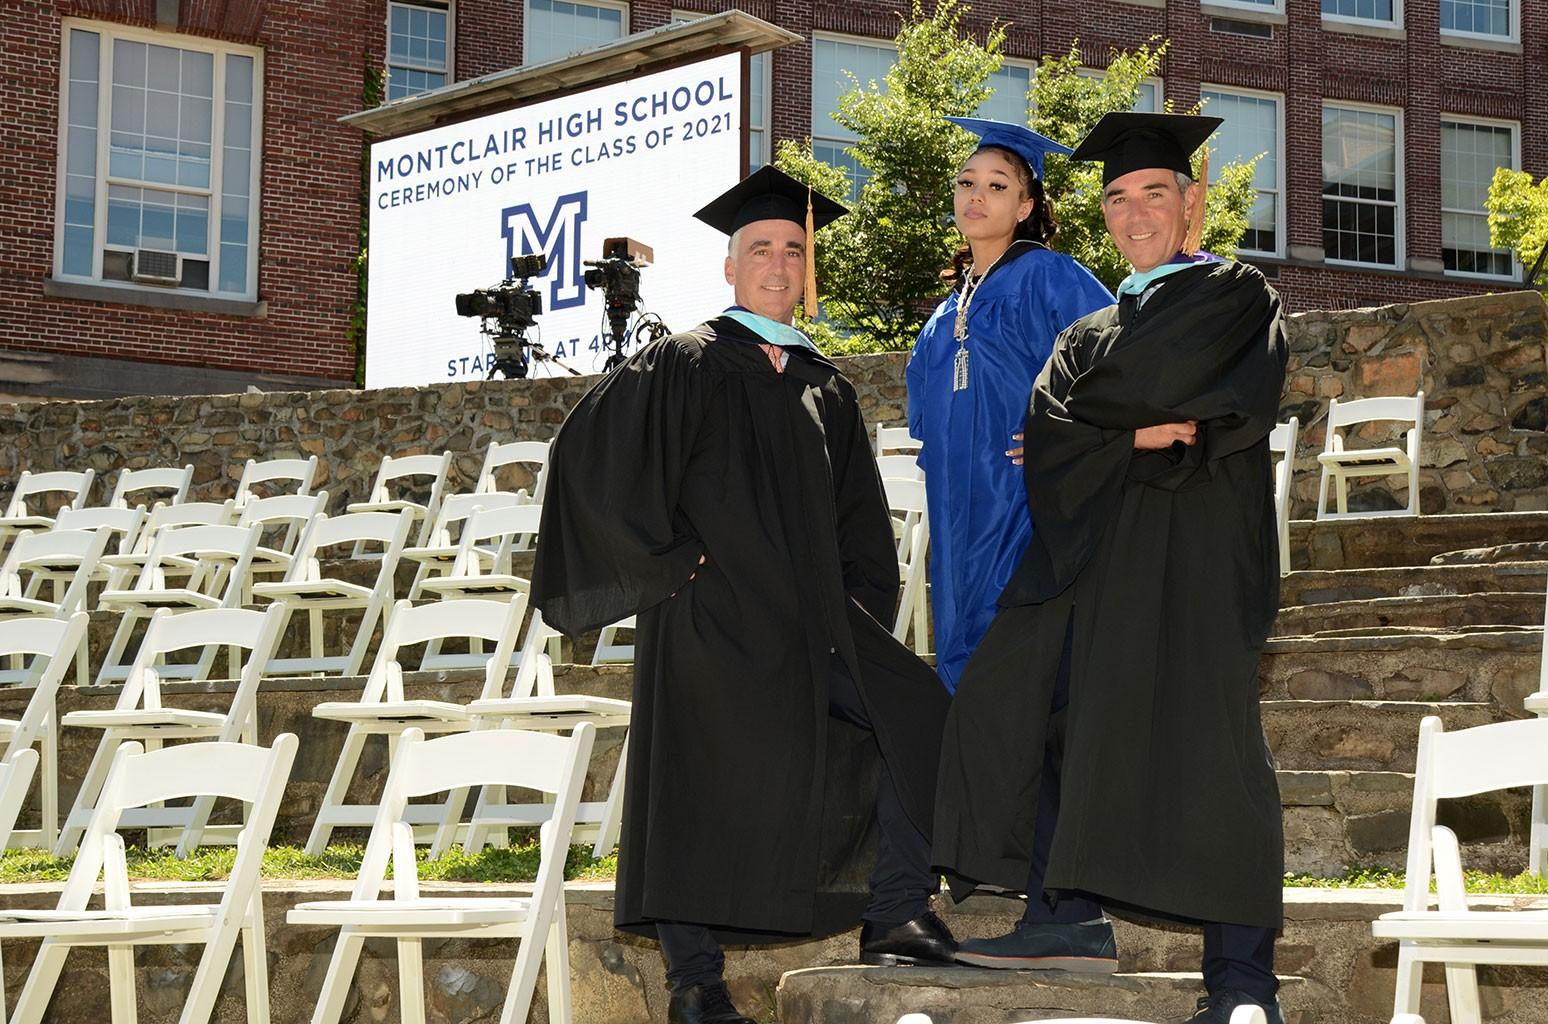 Republic's Monte & Avery Lipman Deliver Graduation Speech at High School Alma Mater